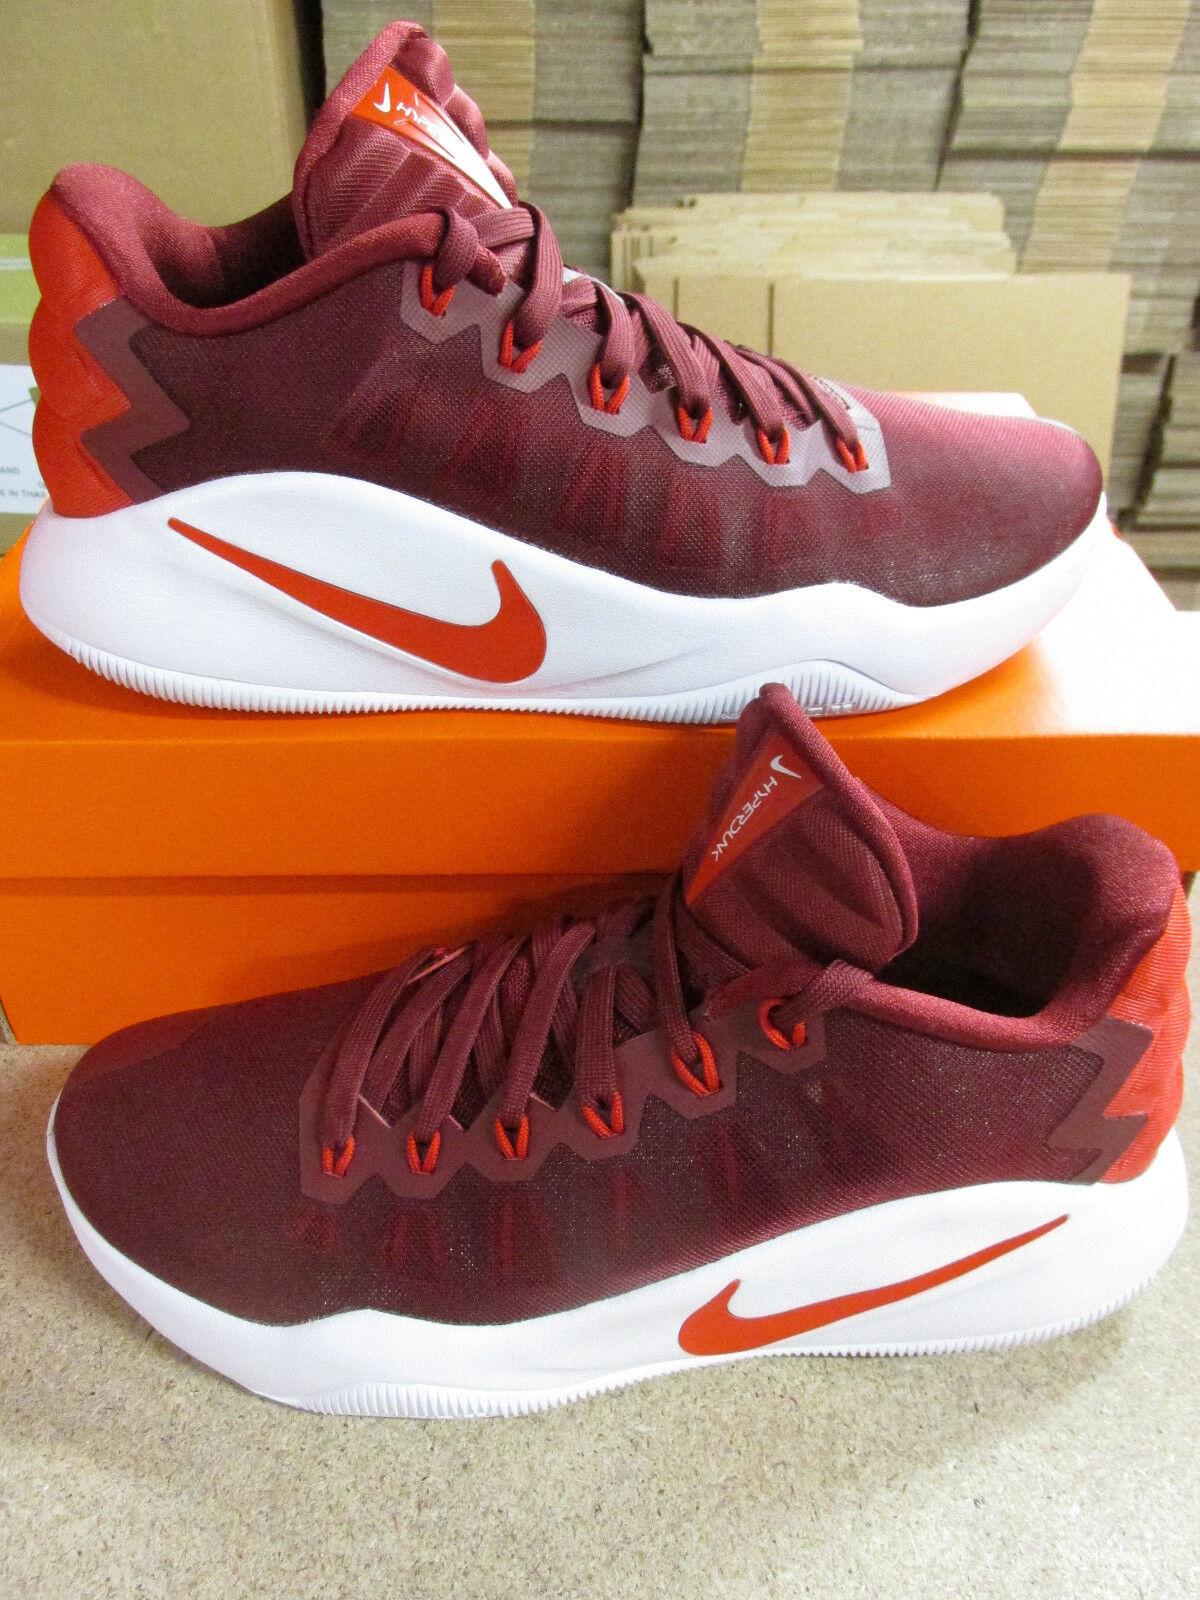 Nike Hyperdunk 2016 Low Mens Basketball Trainers 844363 616 Turnschuhe schuhe